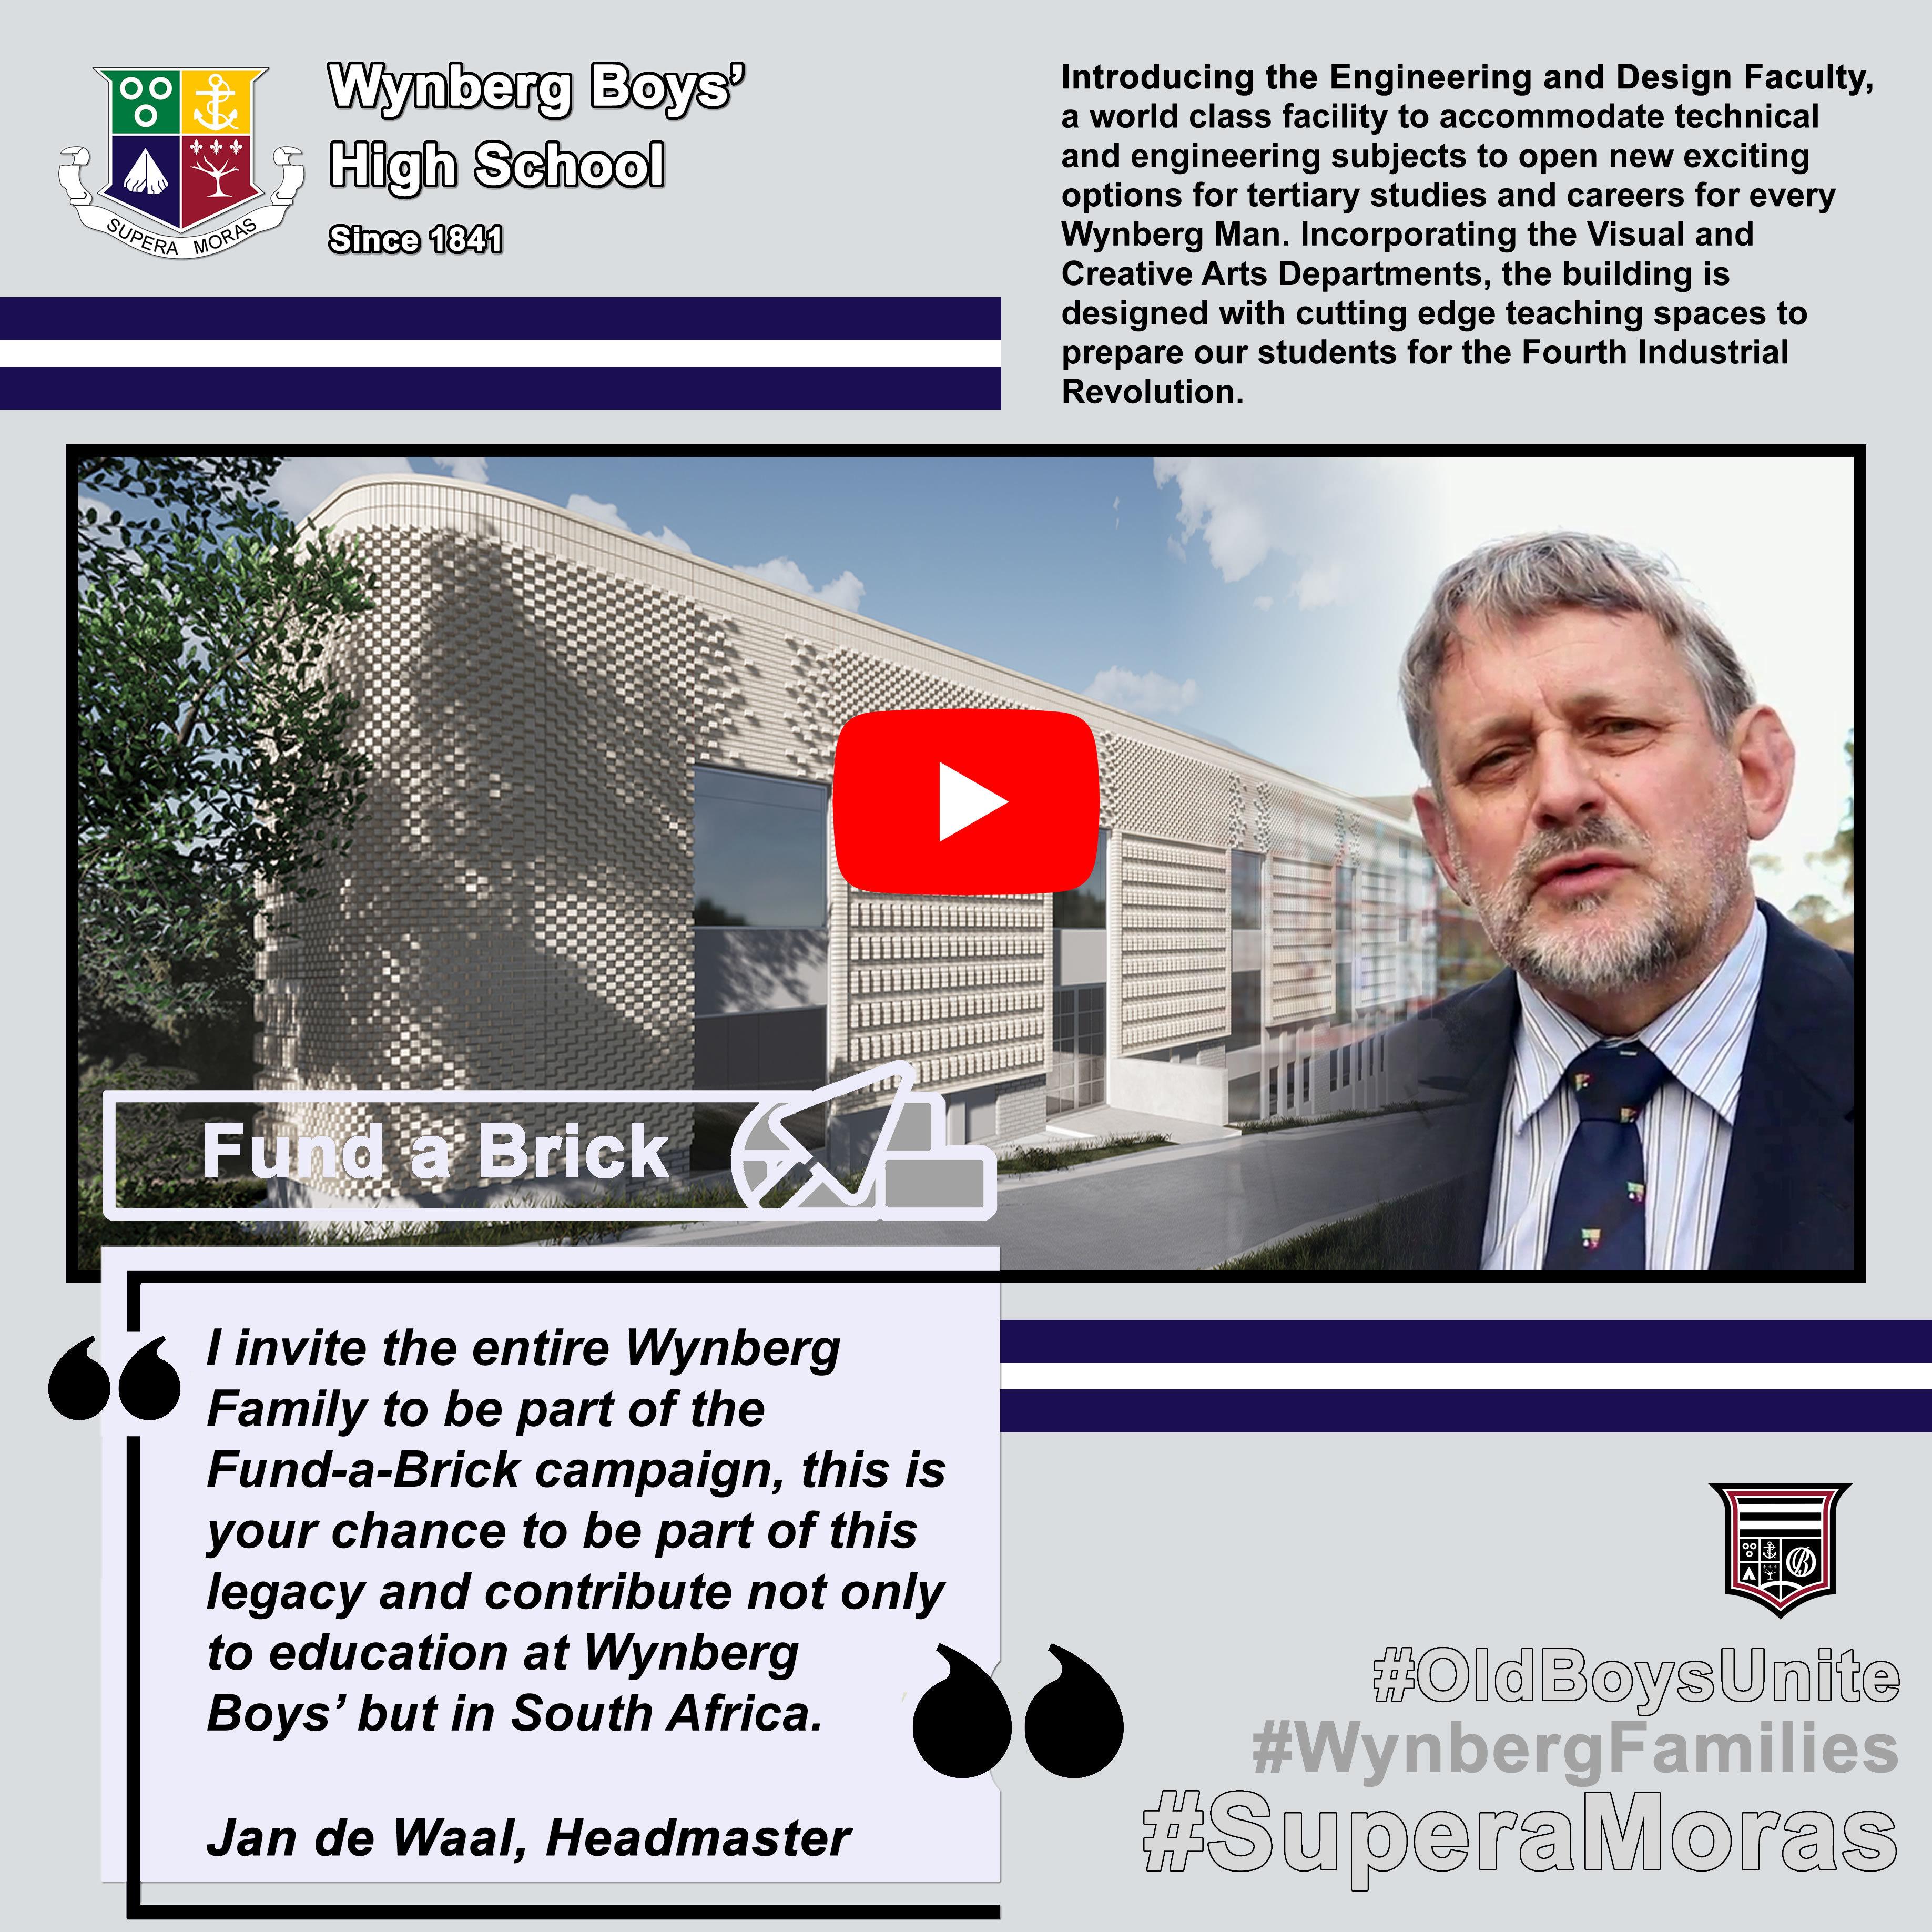 Fund a Brick: Jan de Waal